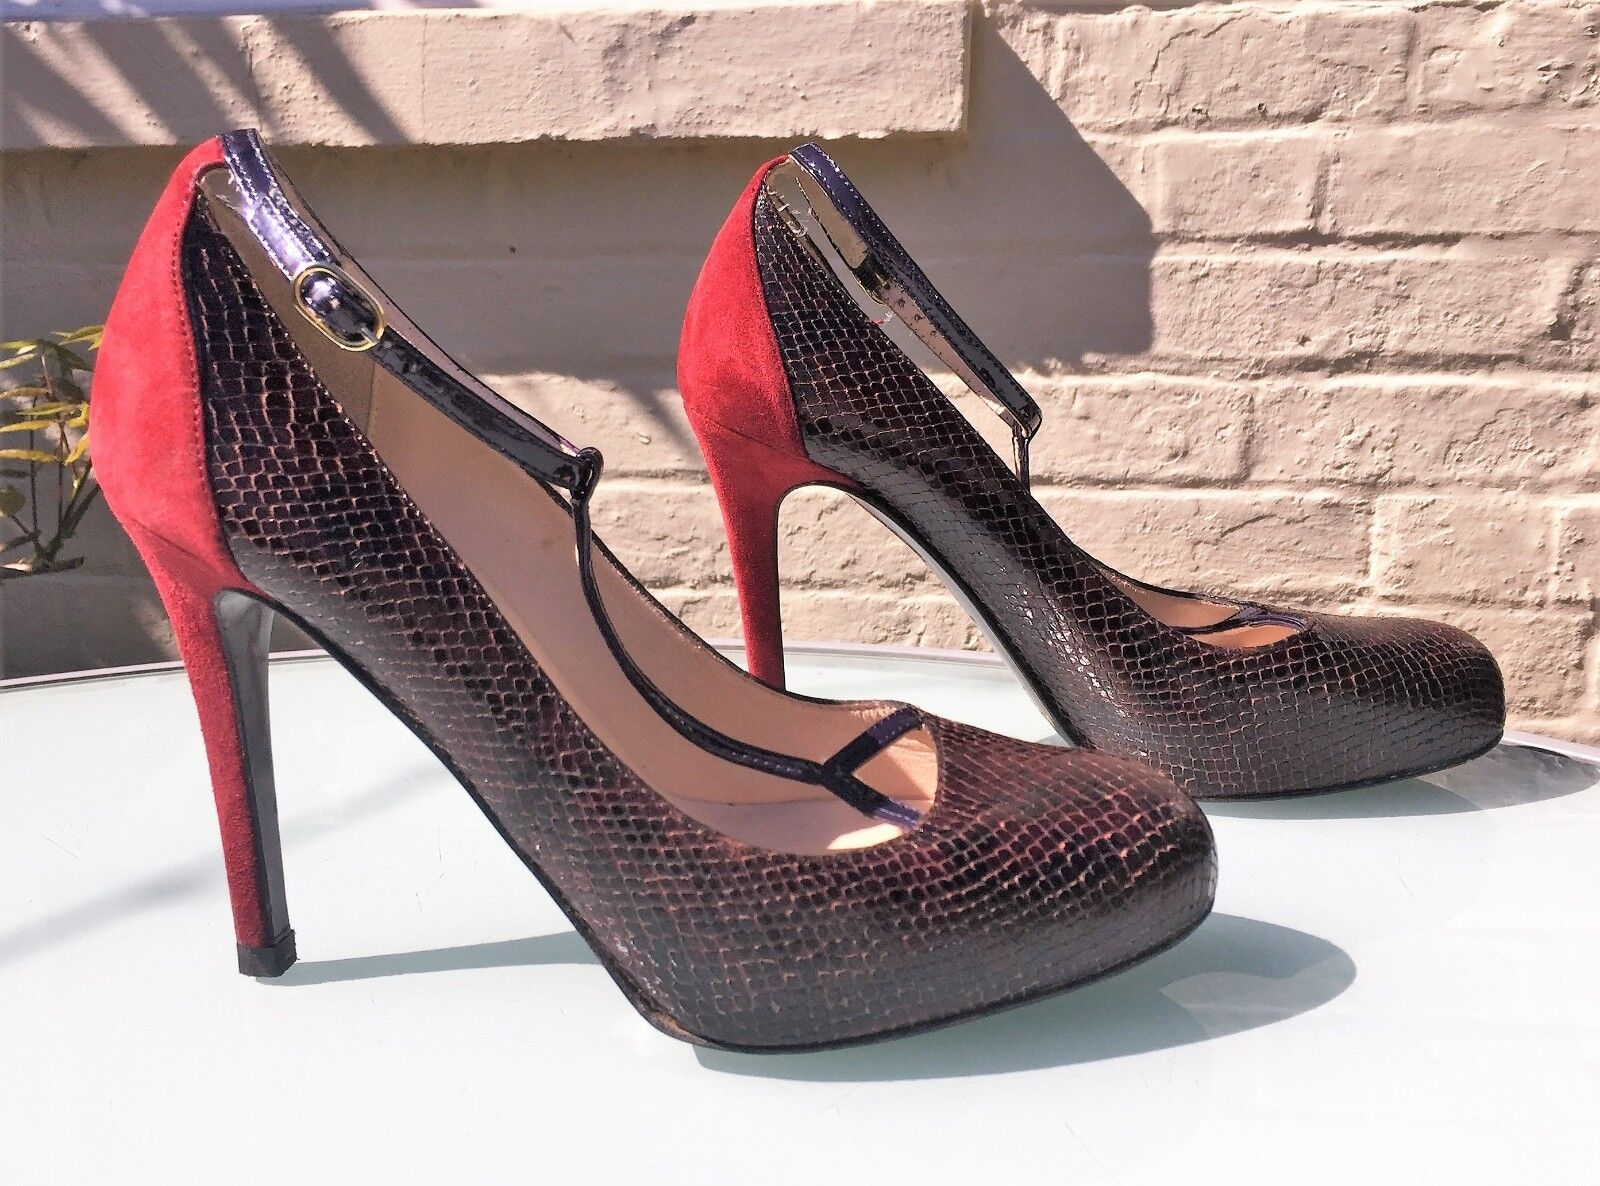 L.K. Bennett T Bar Heels - Wine Suede & Brown Snakeskin Effect - UK 4 - Stunning